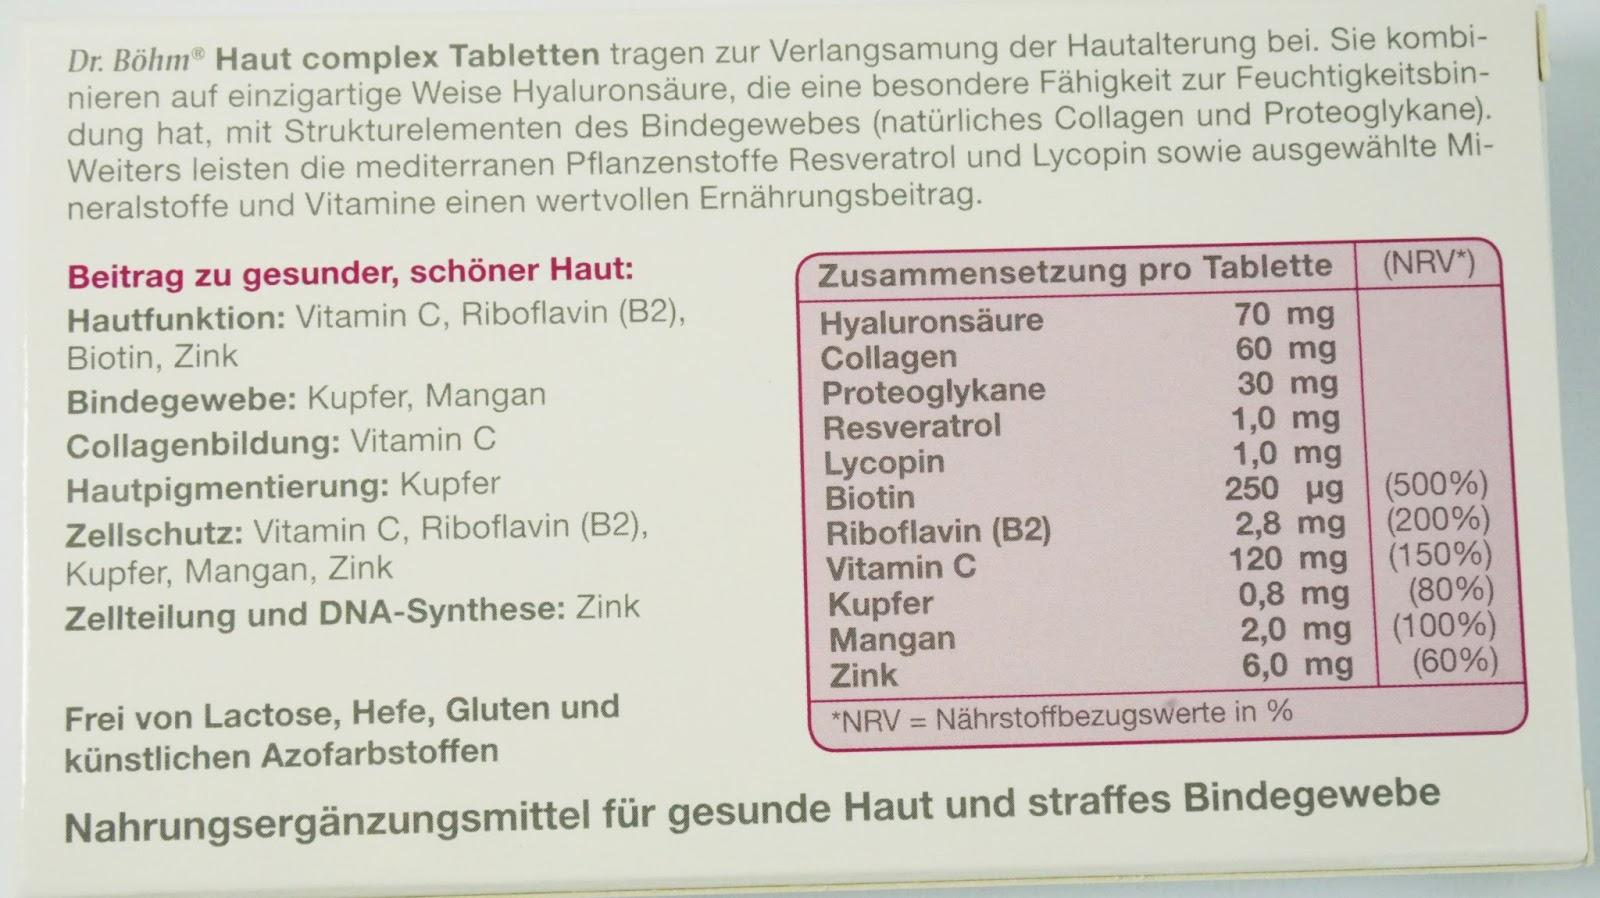 Dr. Böhm - Haut complex mit Hyaluronsäure